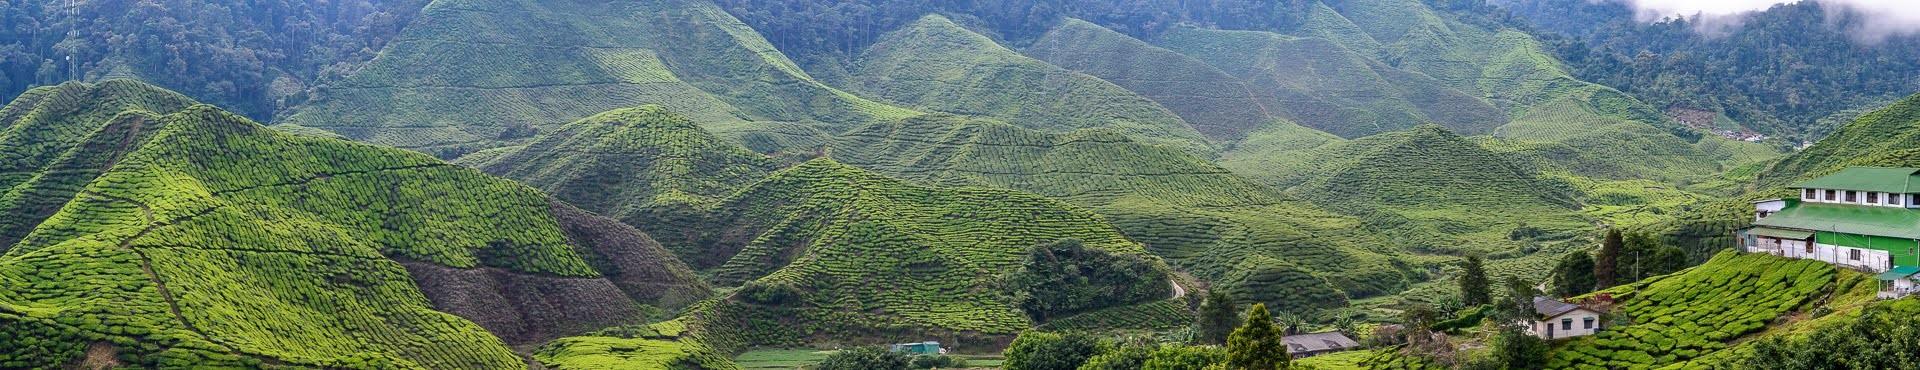 Panorama údolí Cameron Highlands - Malajsie cestopis, Martin Šístek